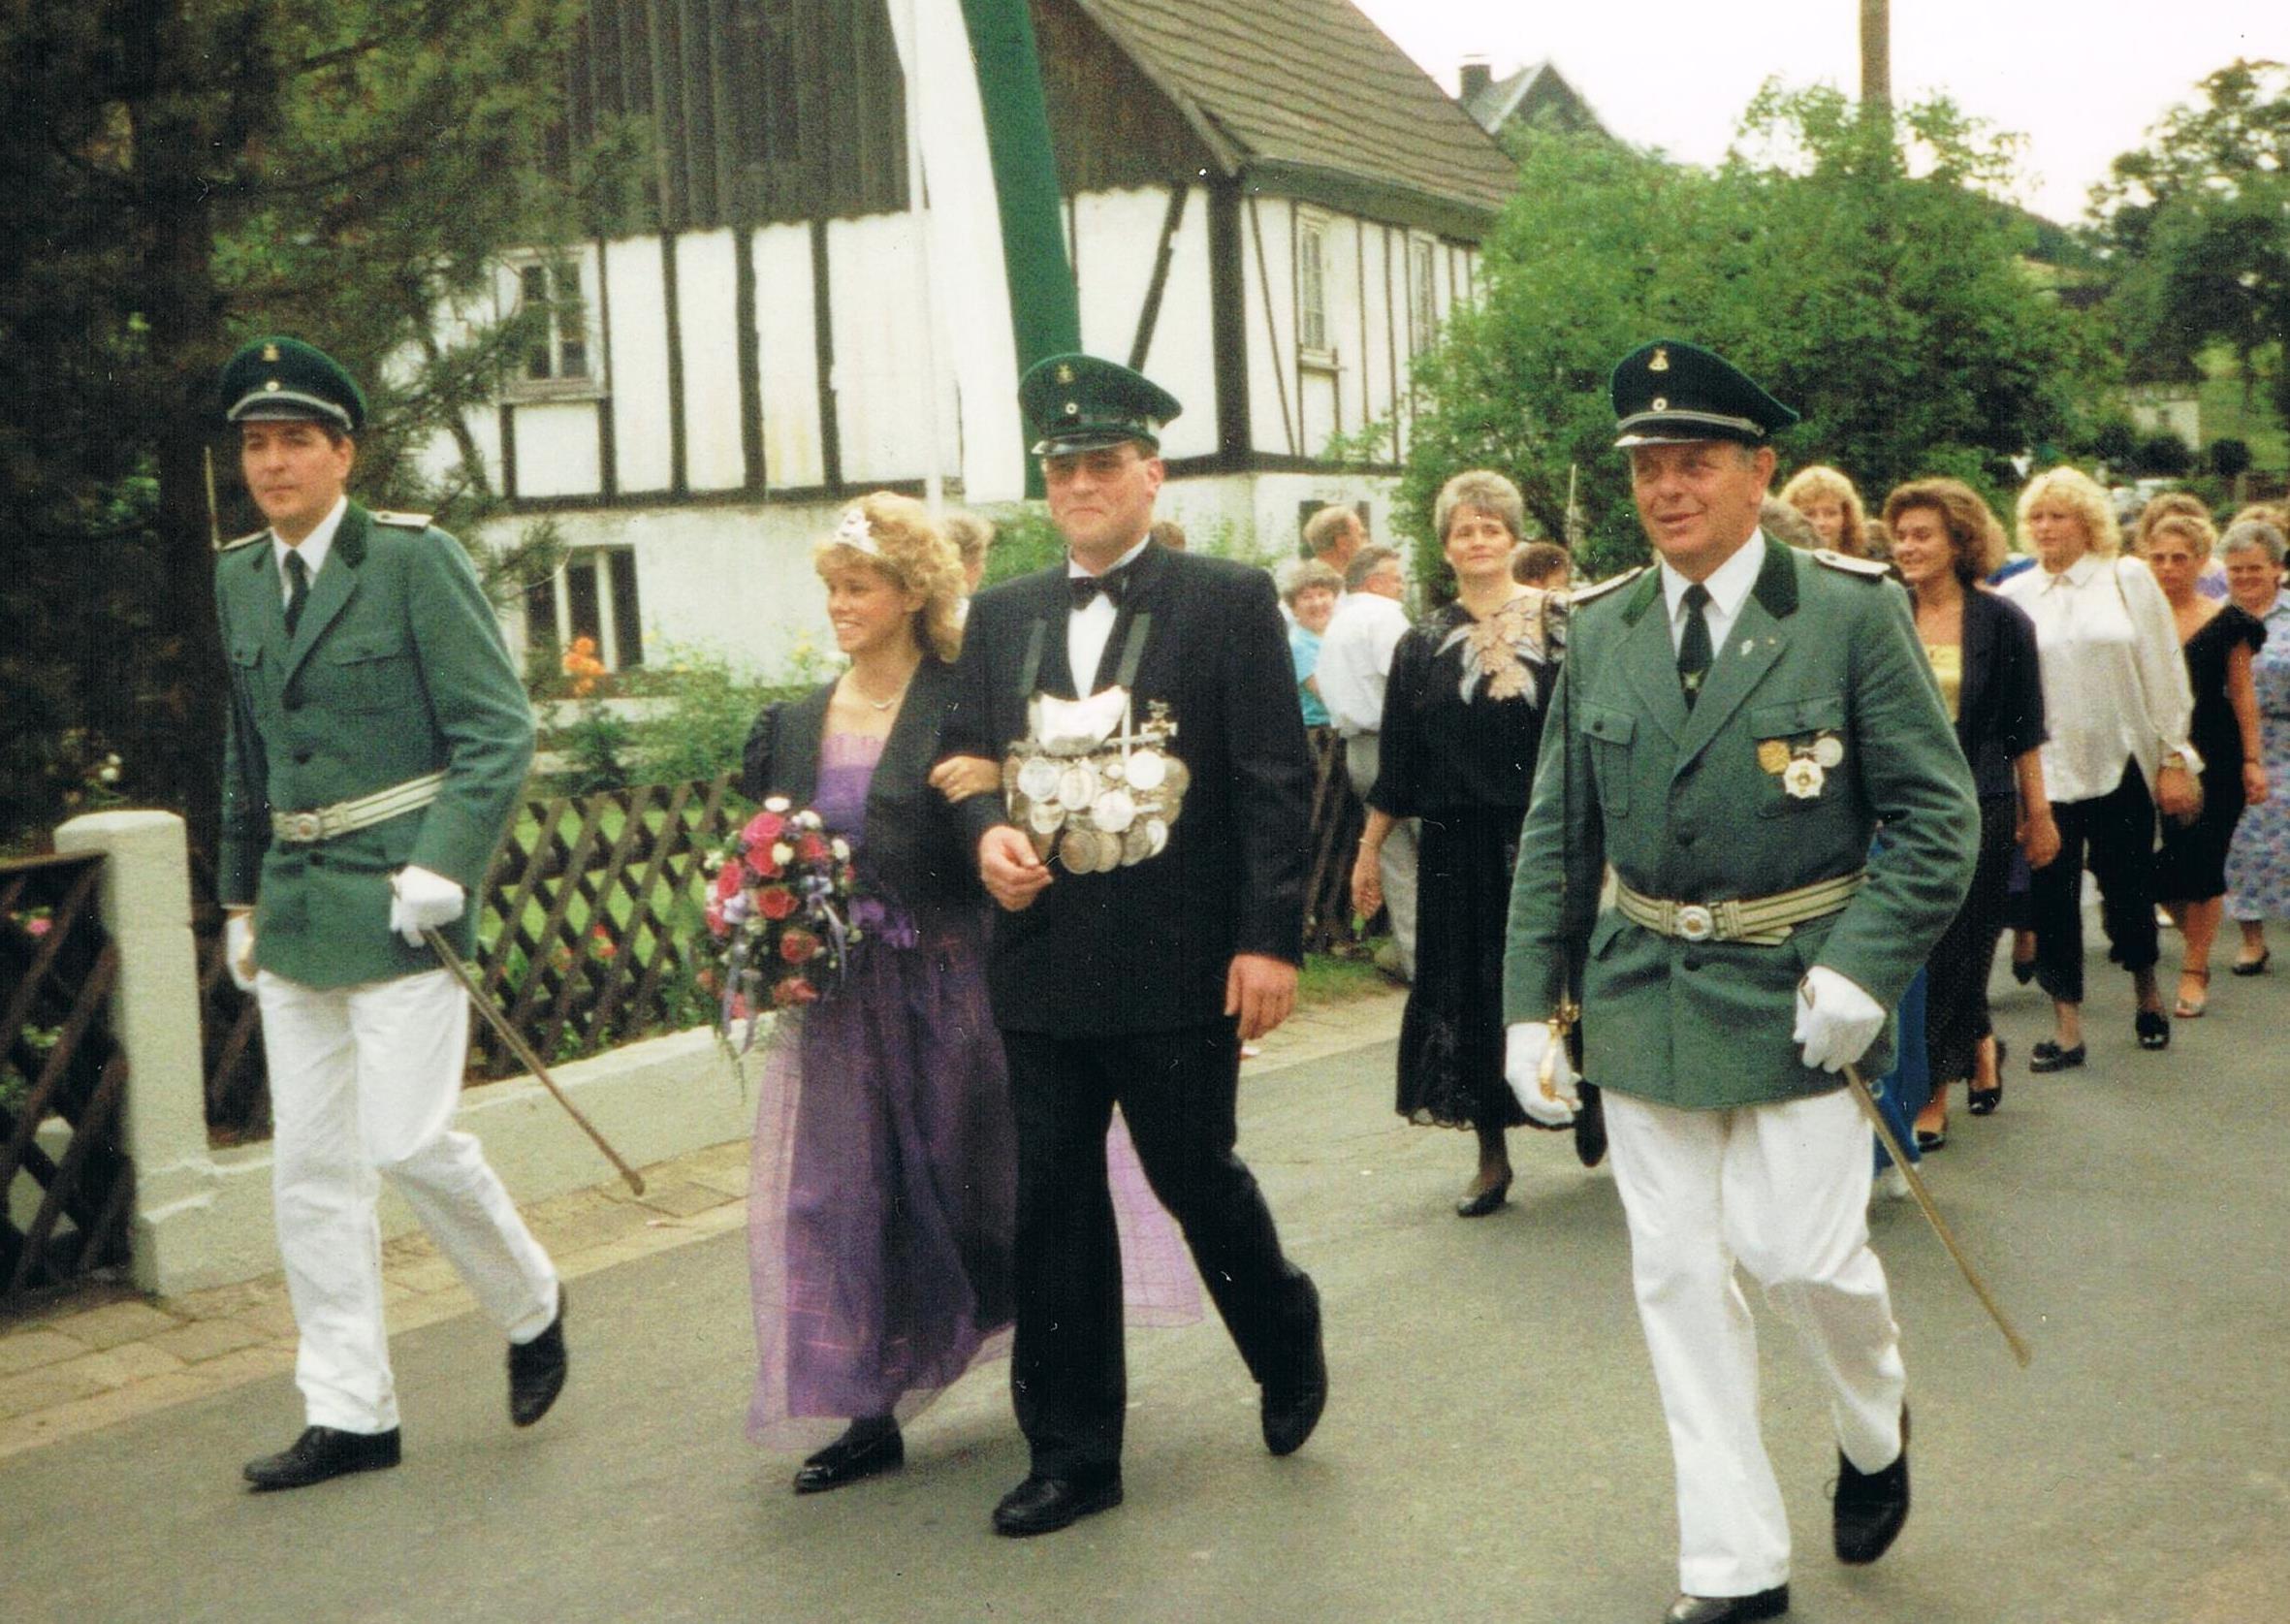 1989_Reiner_Stuff+Jutta_Kleine-25jährigesKönigspaar